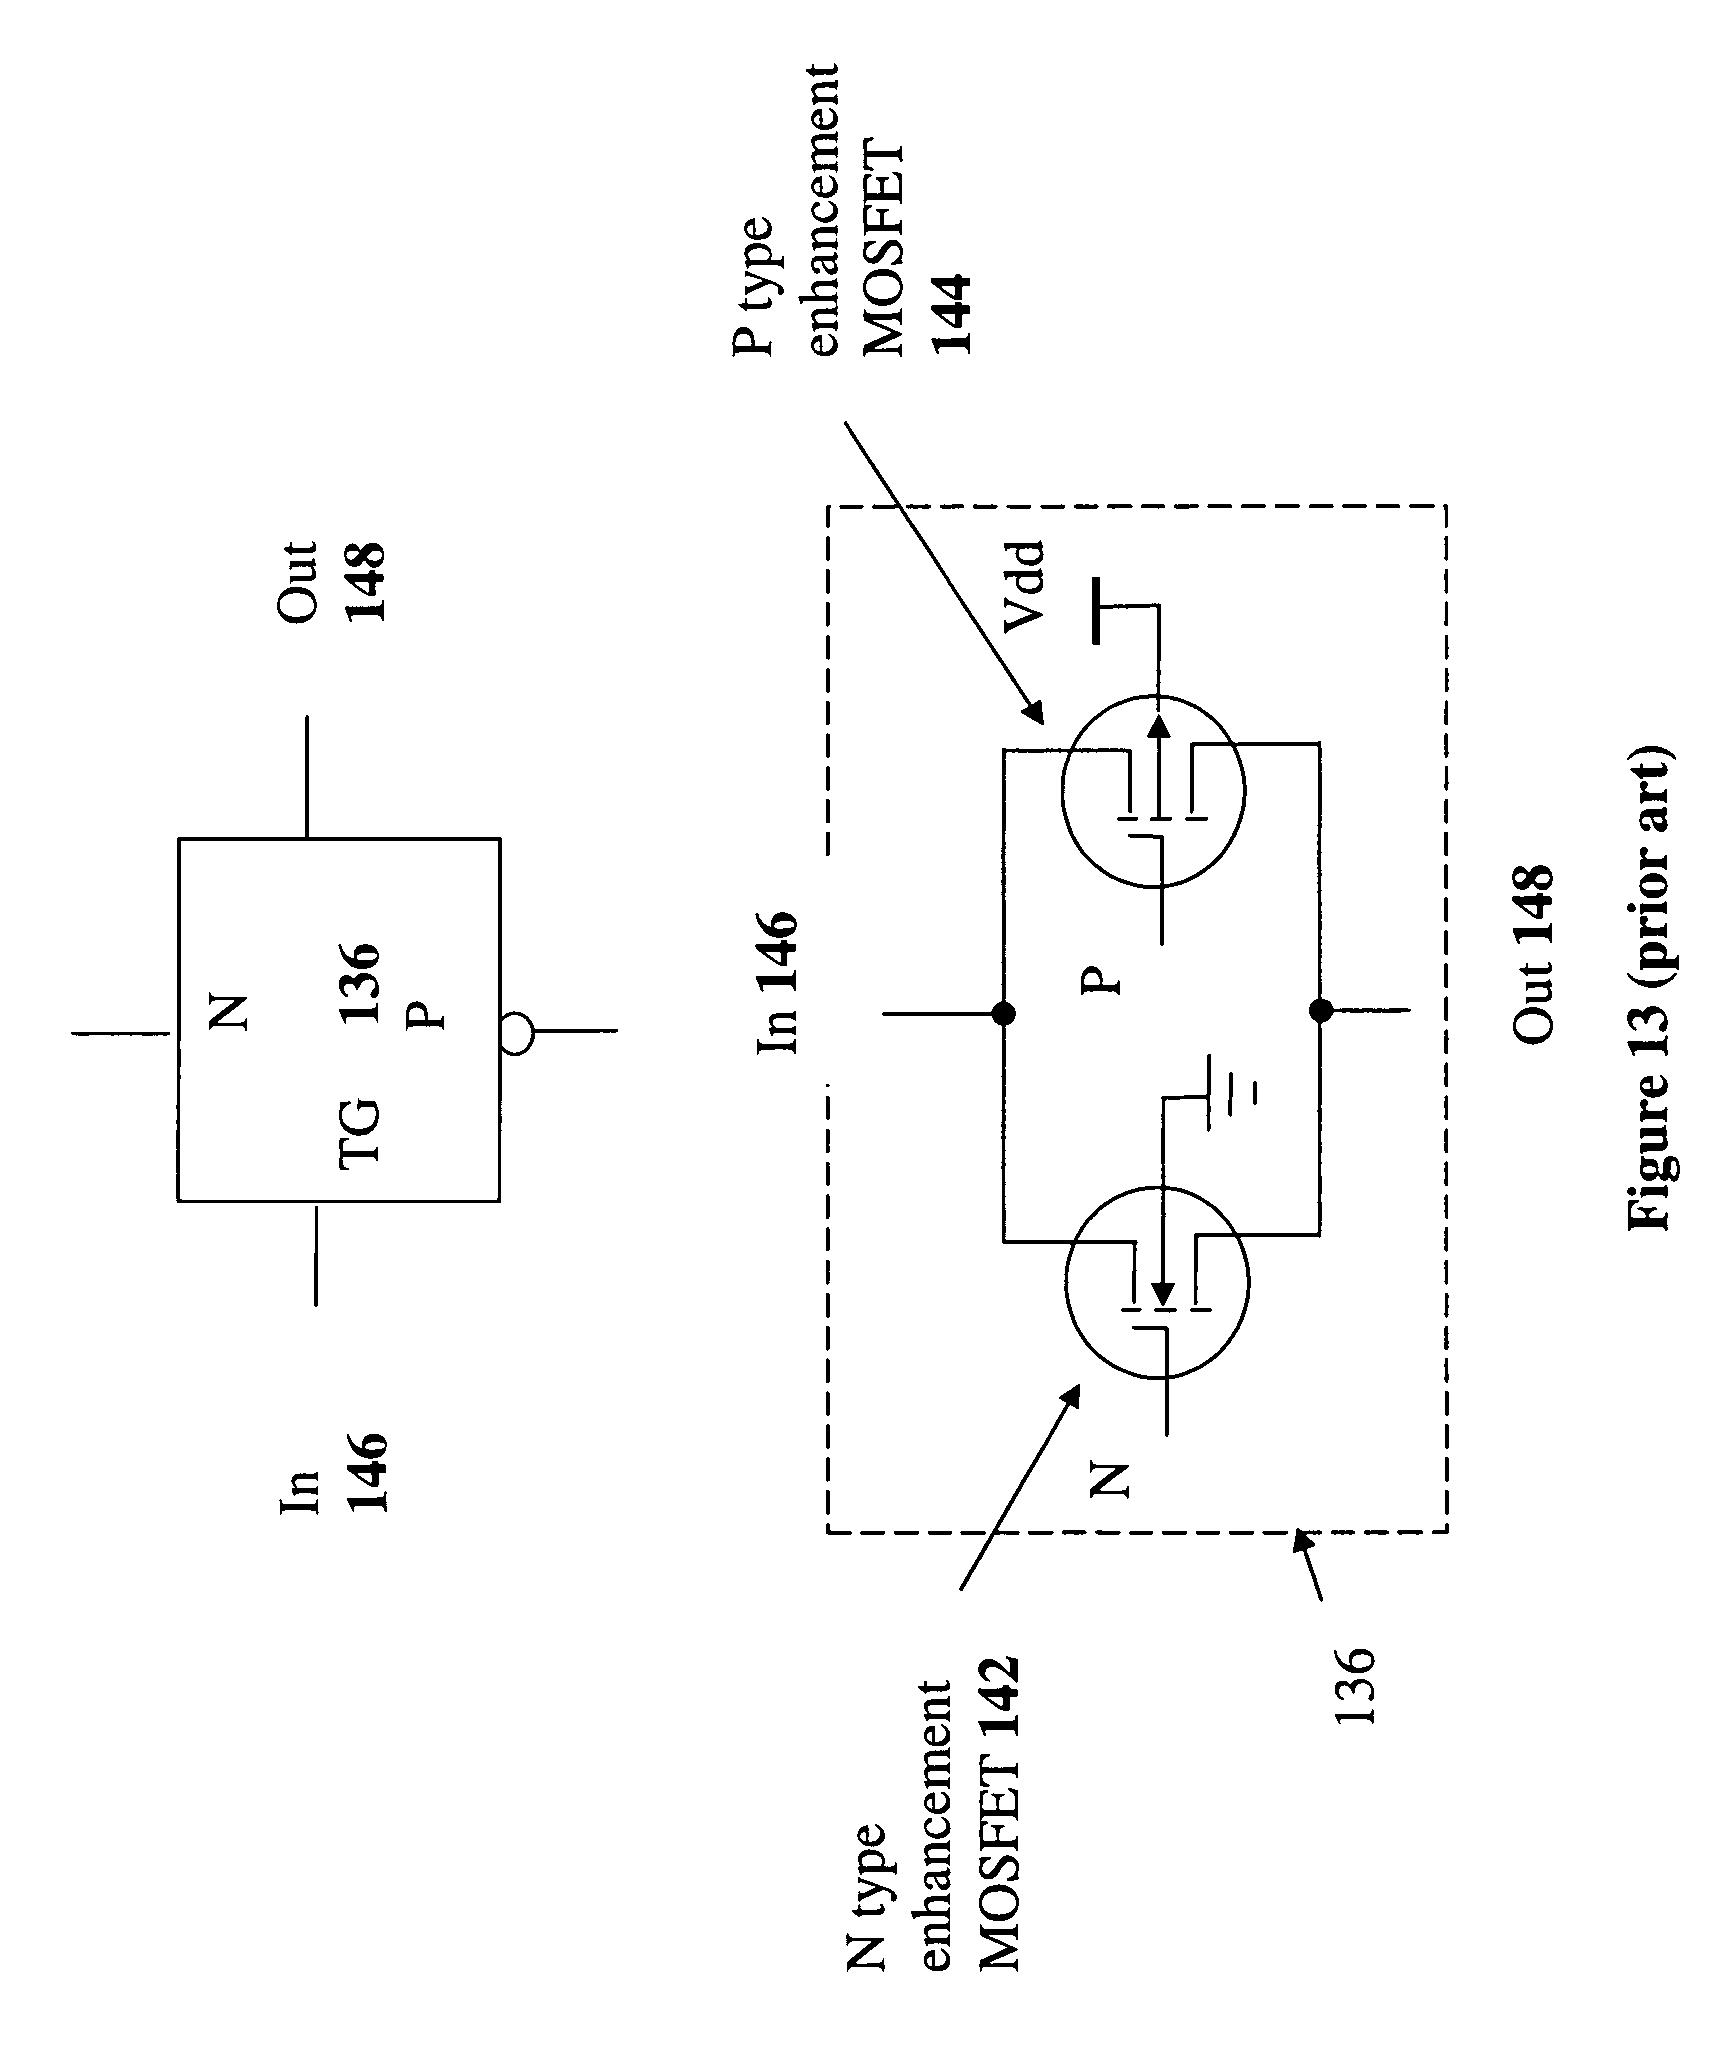 Volume Control Wiring Diagram Tritton - Wiring Diagram Home